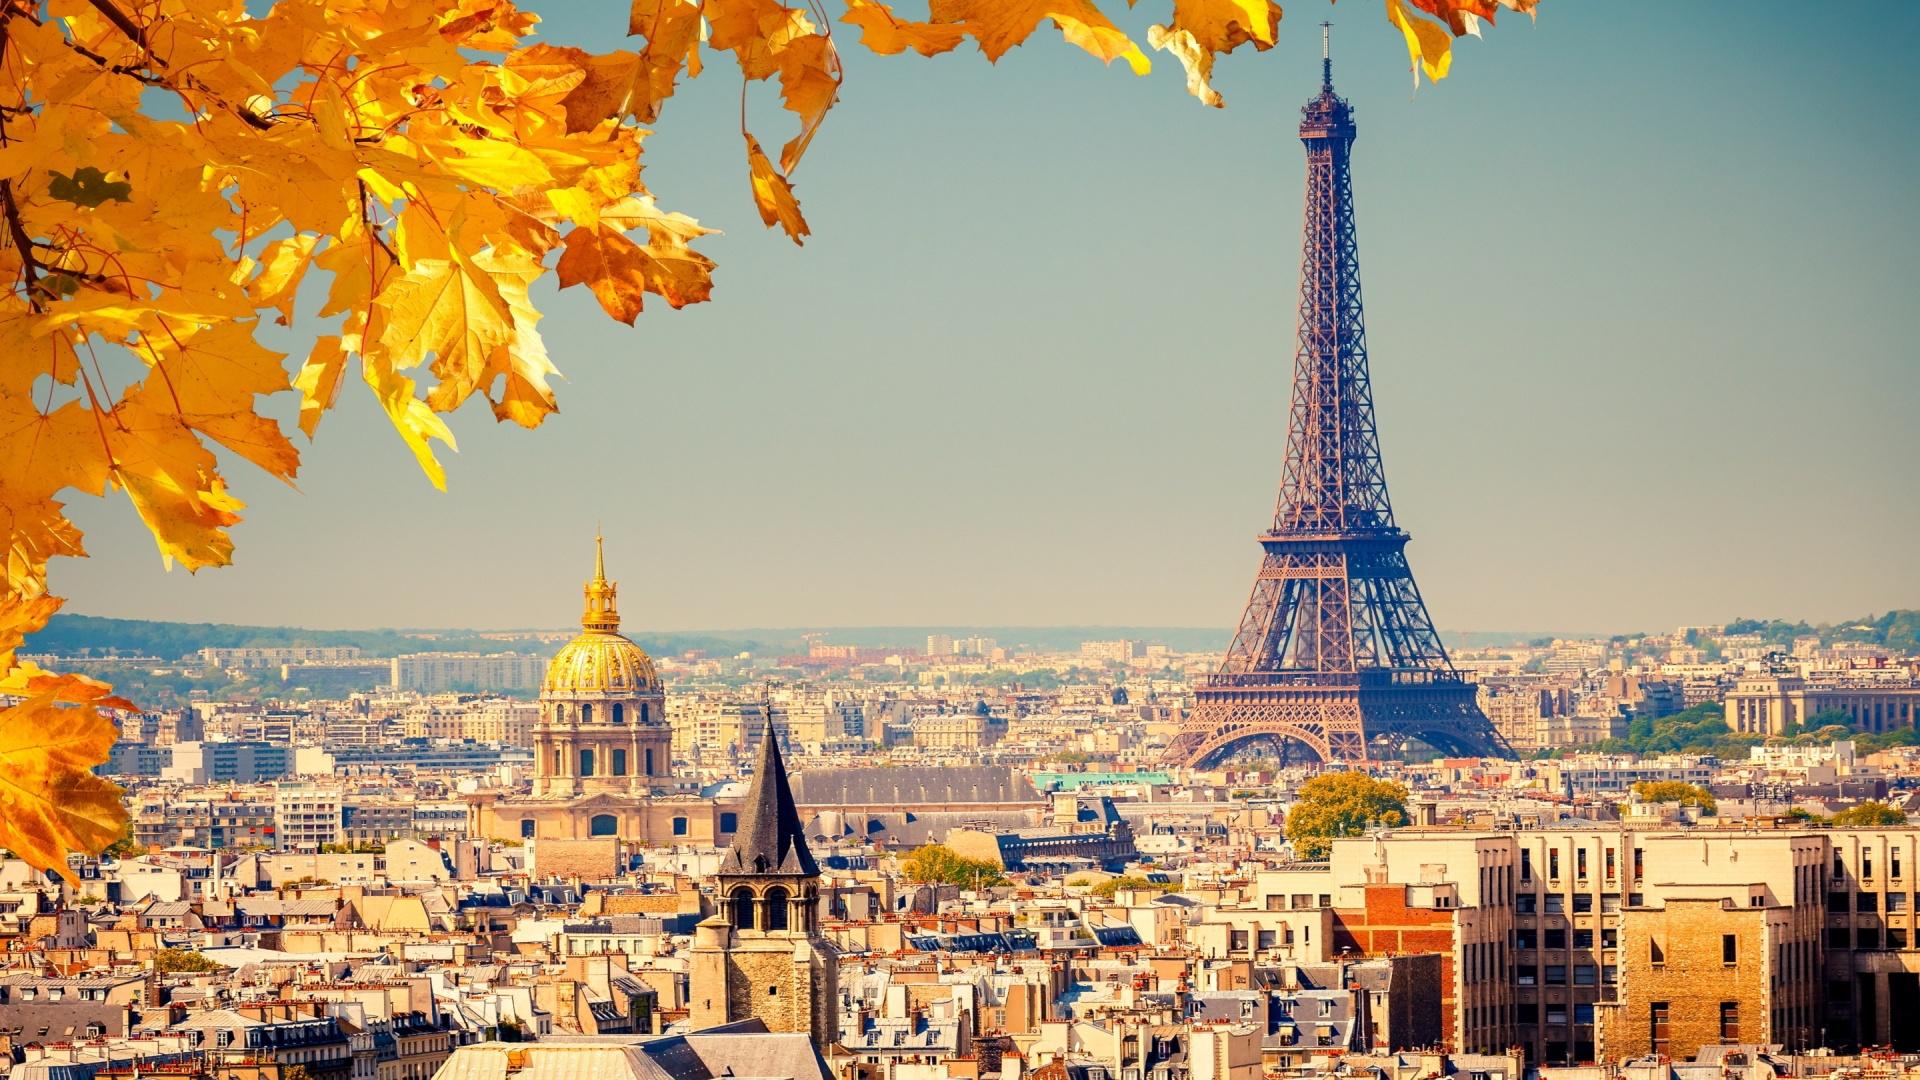 Download Hd Paris Wallpapers For Desktop Background Free Hd 1920x1080